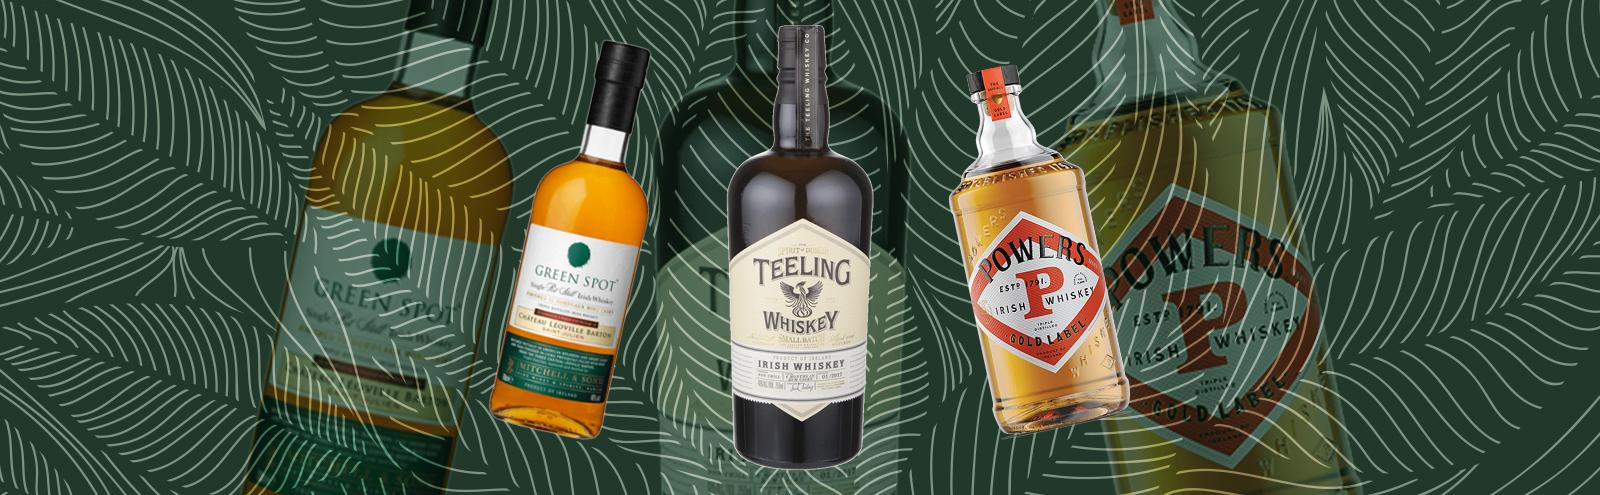 We Asked Bartenders For Their Favorite Irish Whiskeys For Summer